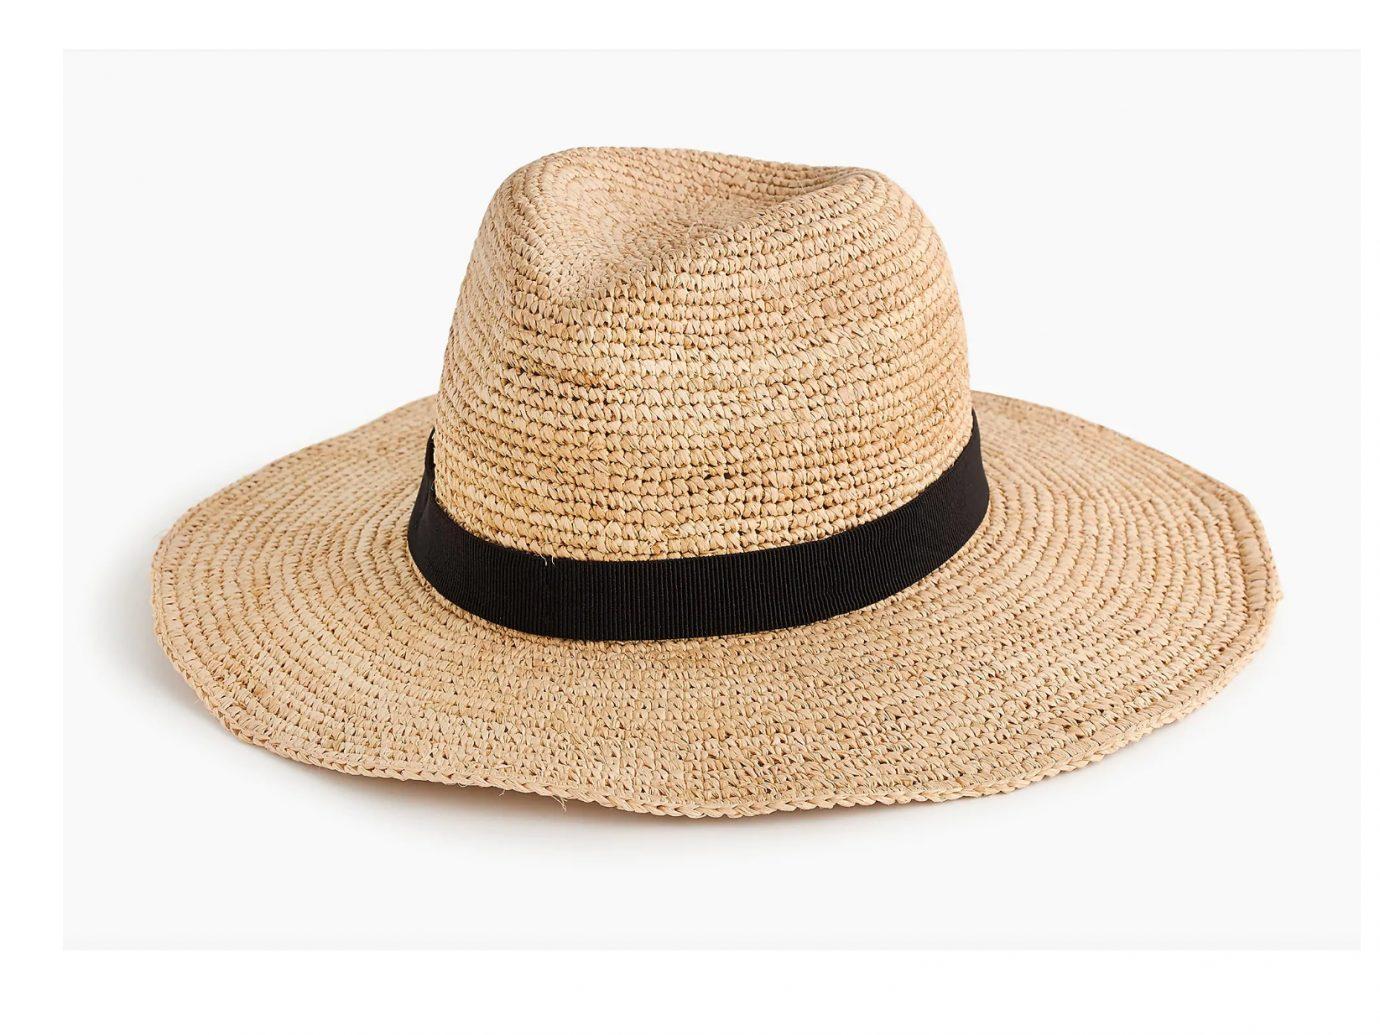 J. Crew Wide-Brim Packable Straw Hat